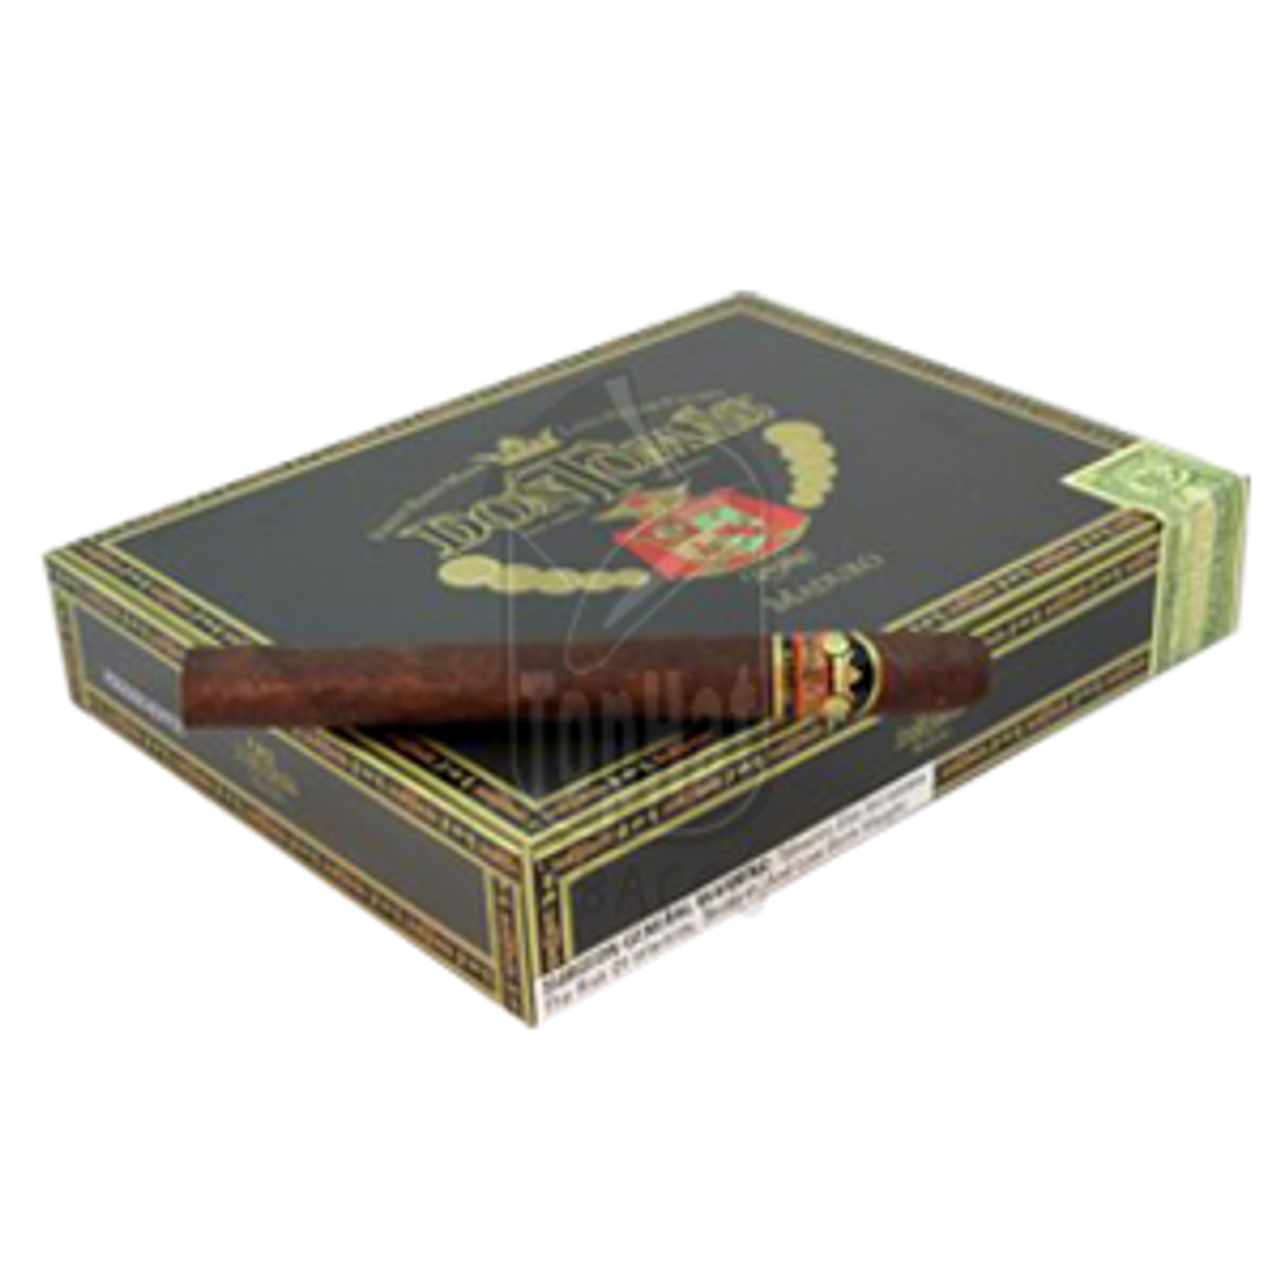 Don Tomas Clasico Presidente Maduro Cigars - 7 x 50 (Box of 25)